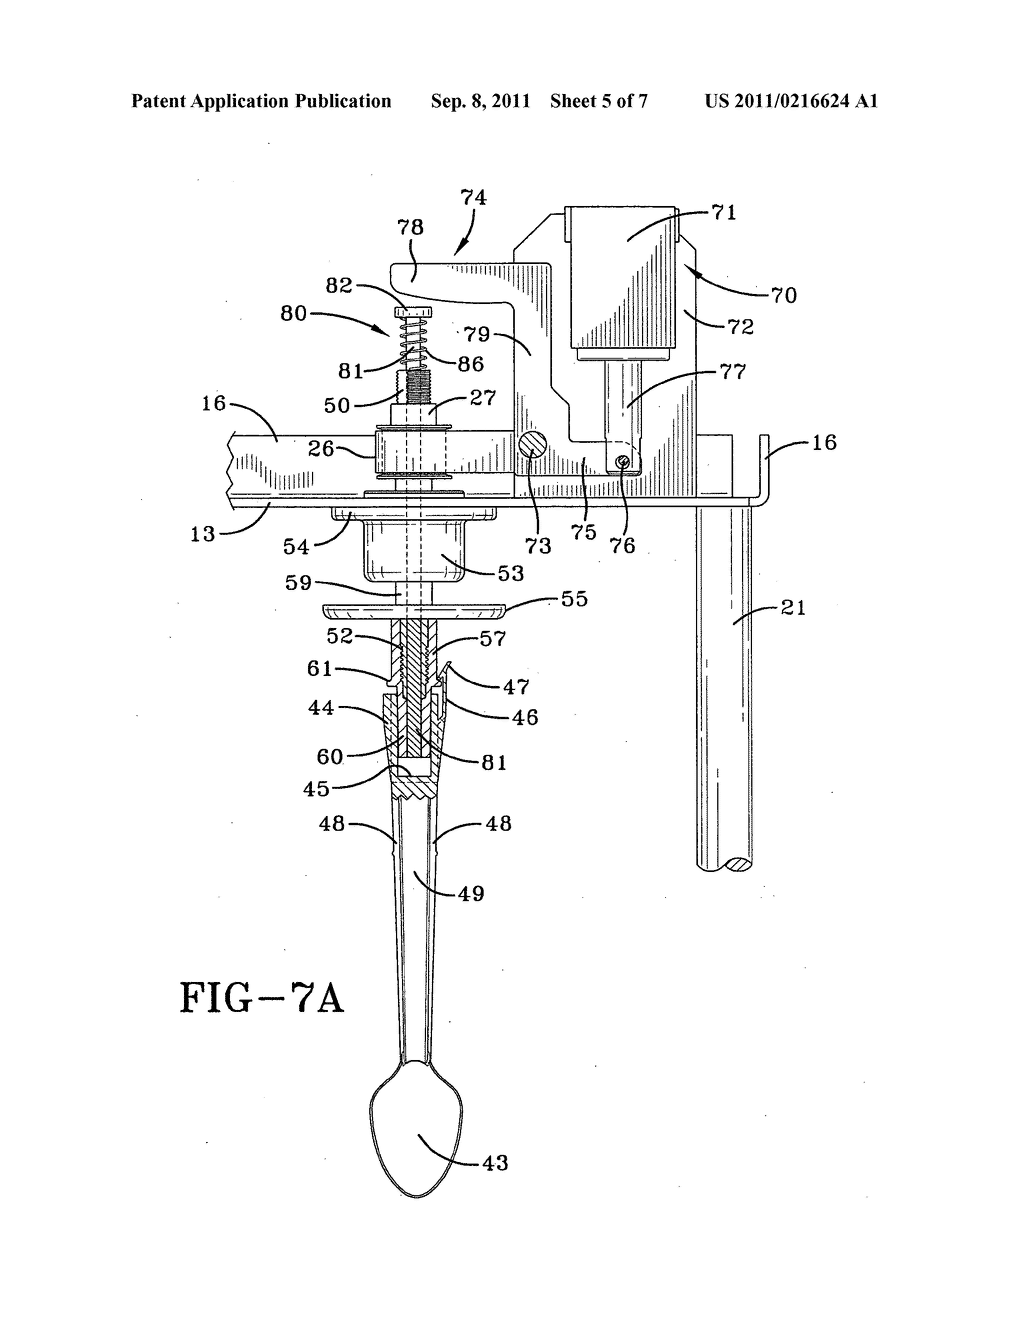 Food Mixer Diagram Wire Data Schema Wiring Agitator Release For A Schematic And Image 06 Rh Patentsencyclopedia Com Rubber